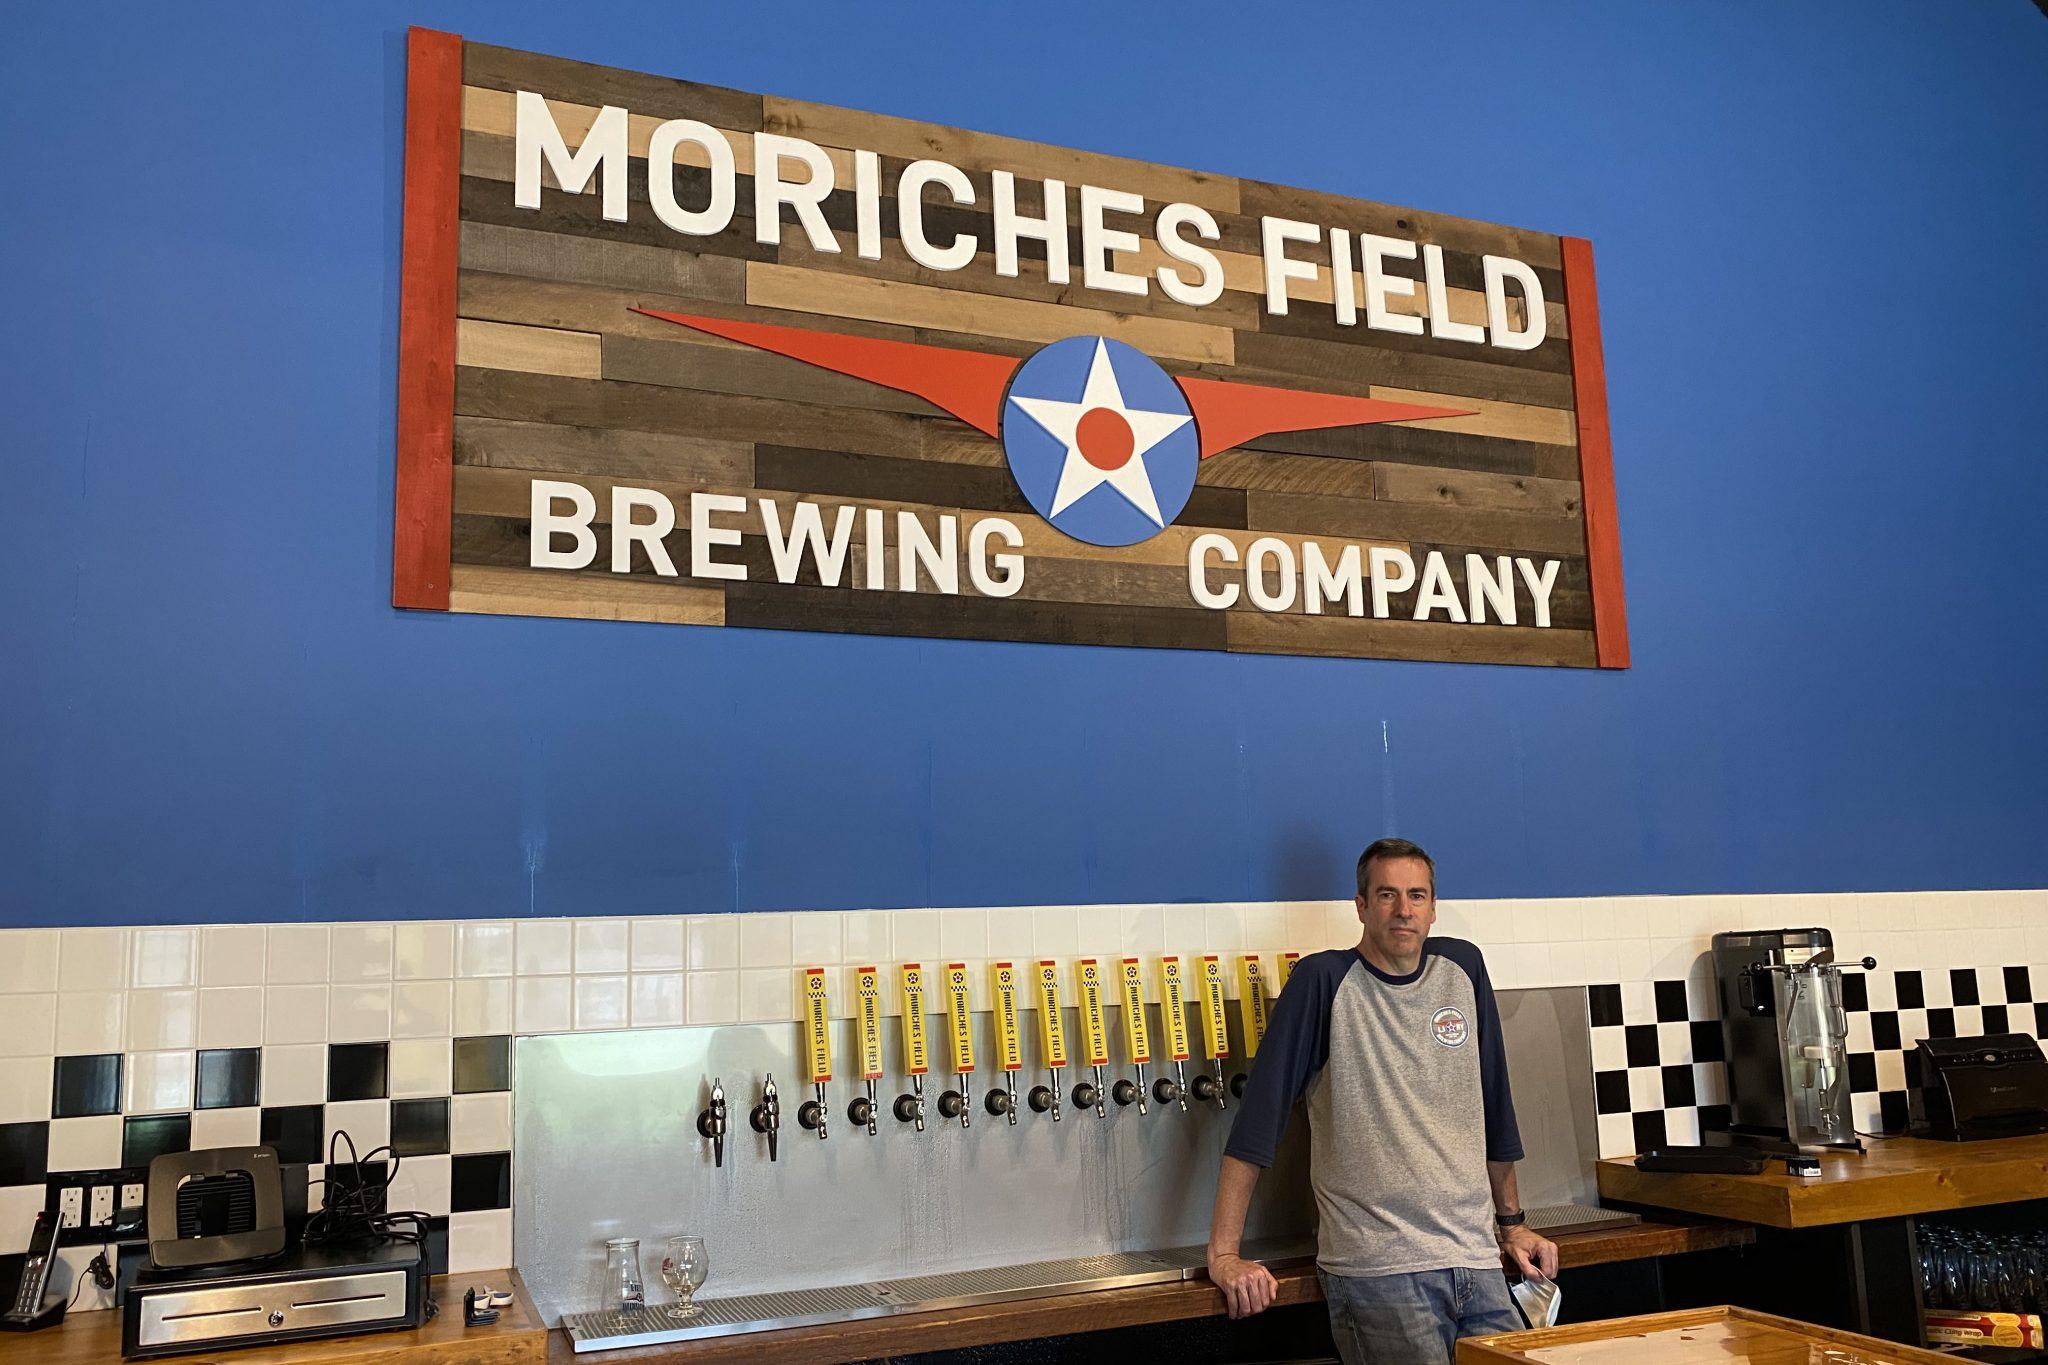 Rich Flynn Moriches Field Brewing Co.